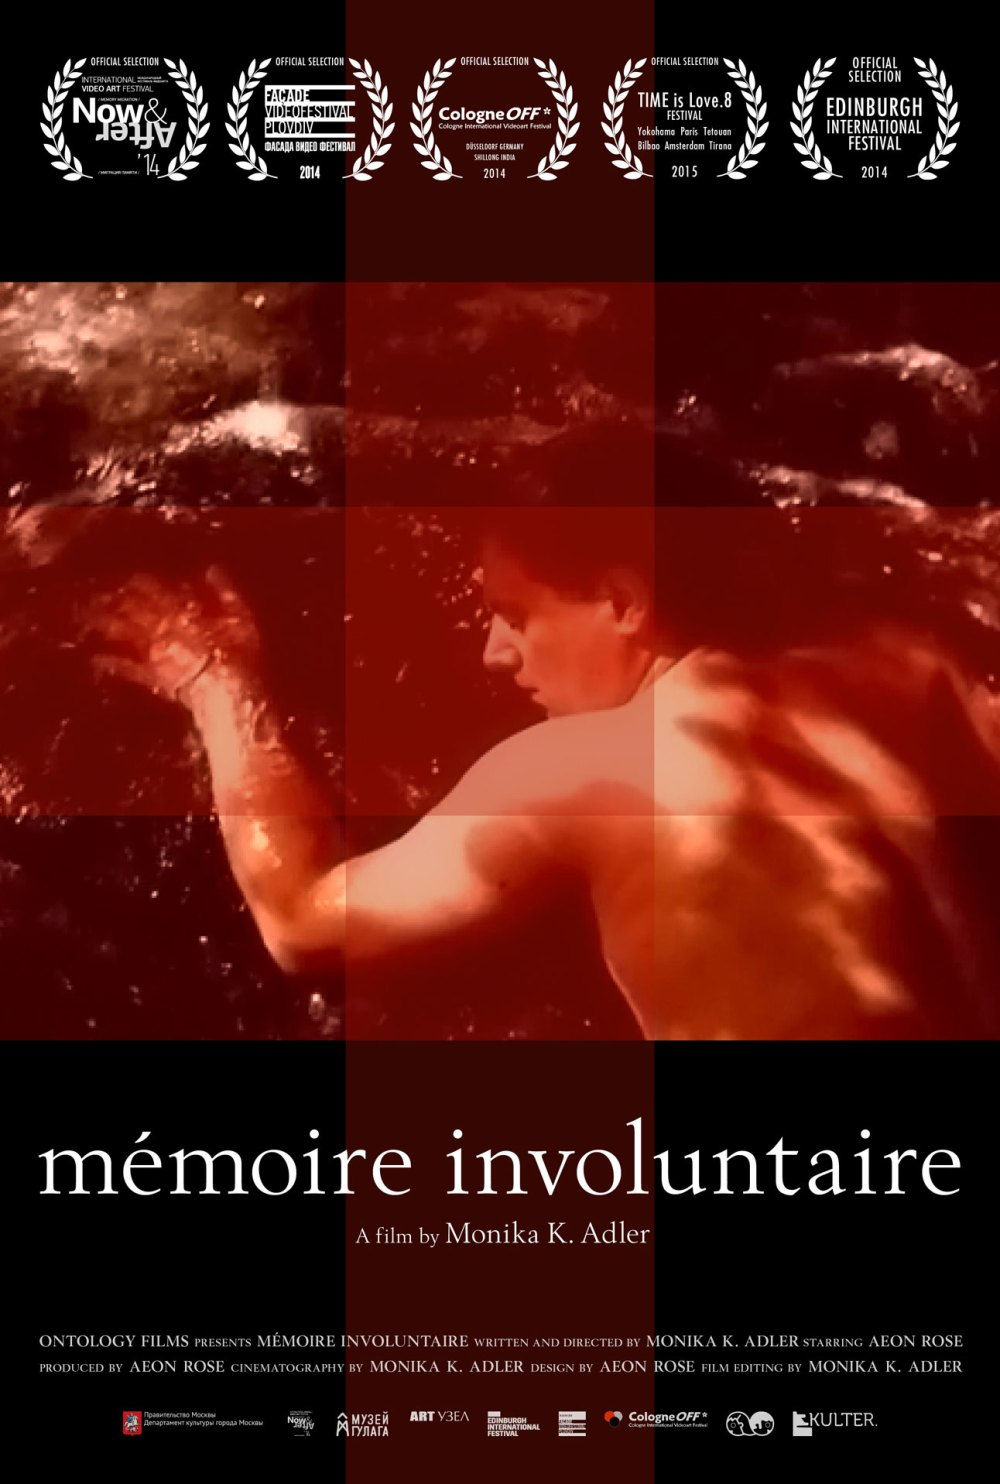 Monika K. Adler, involuntary memory, 2014, film poster, Aeon Rose